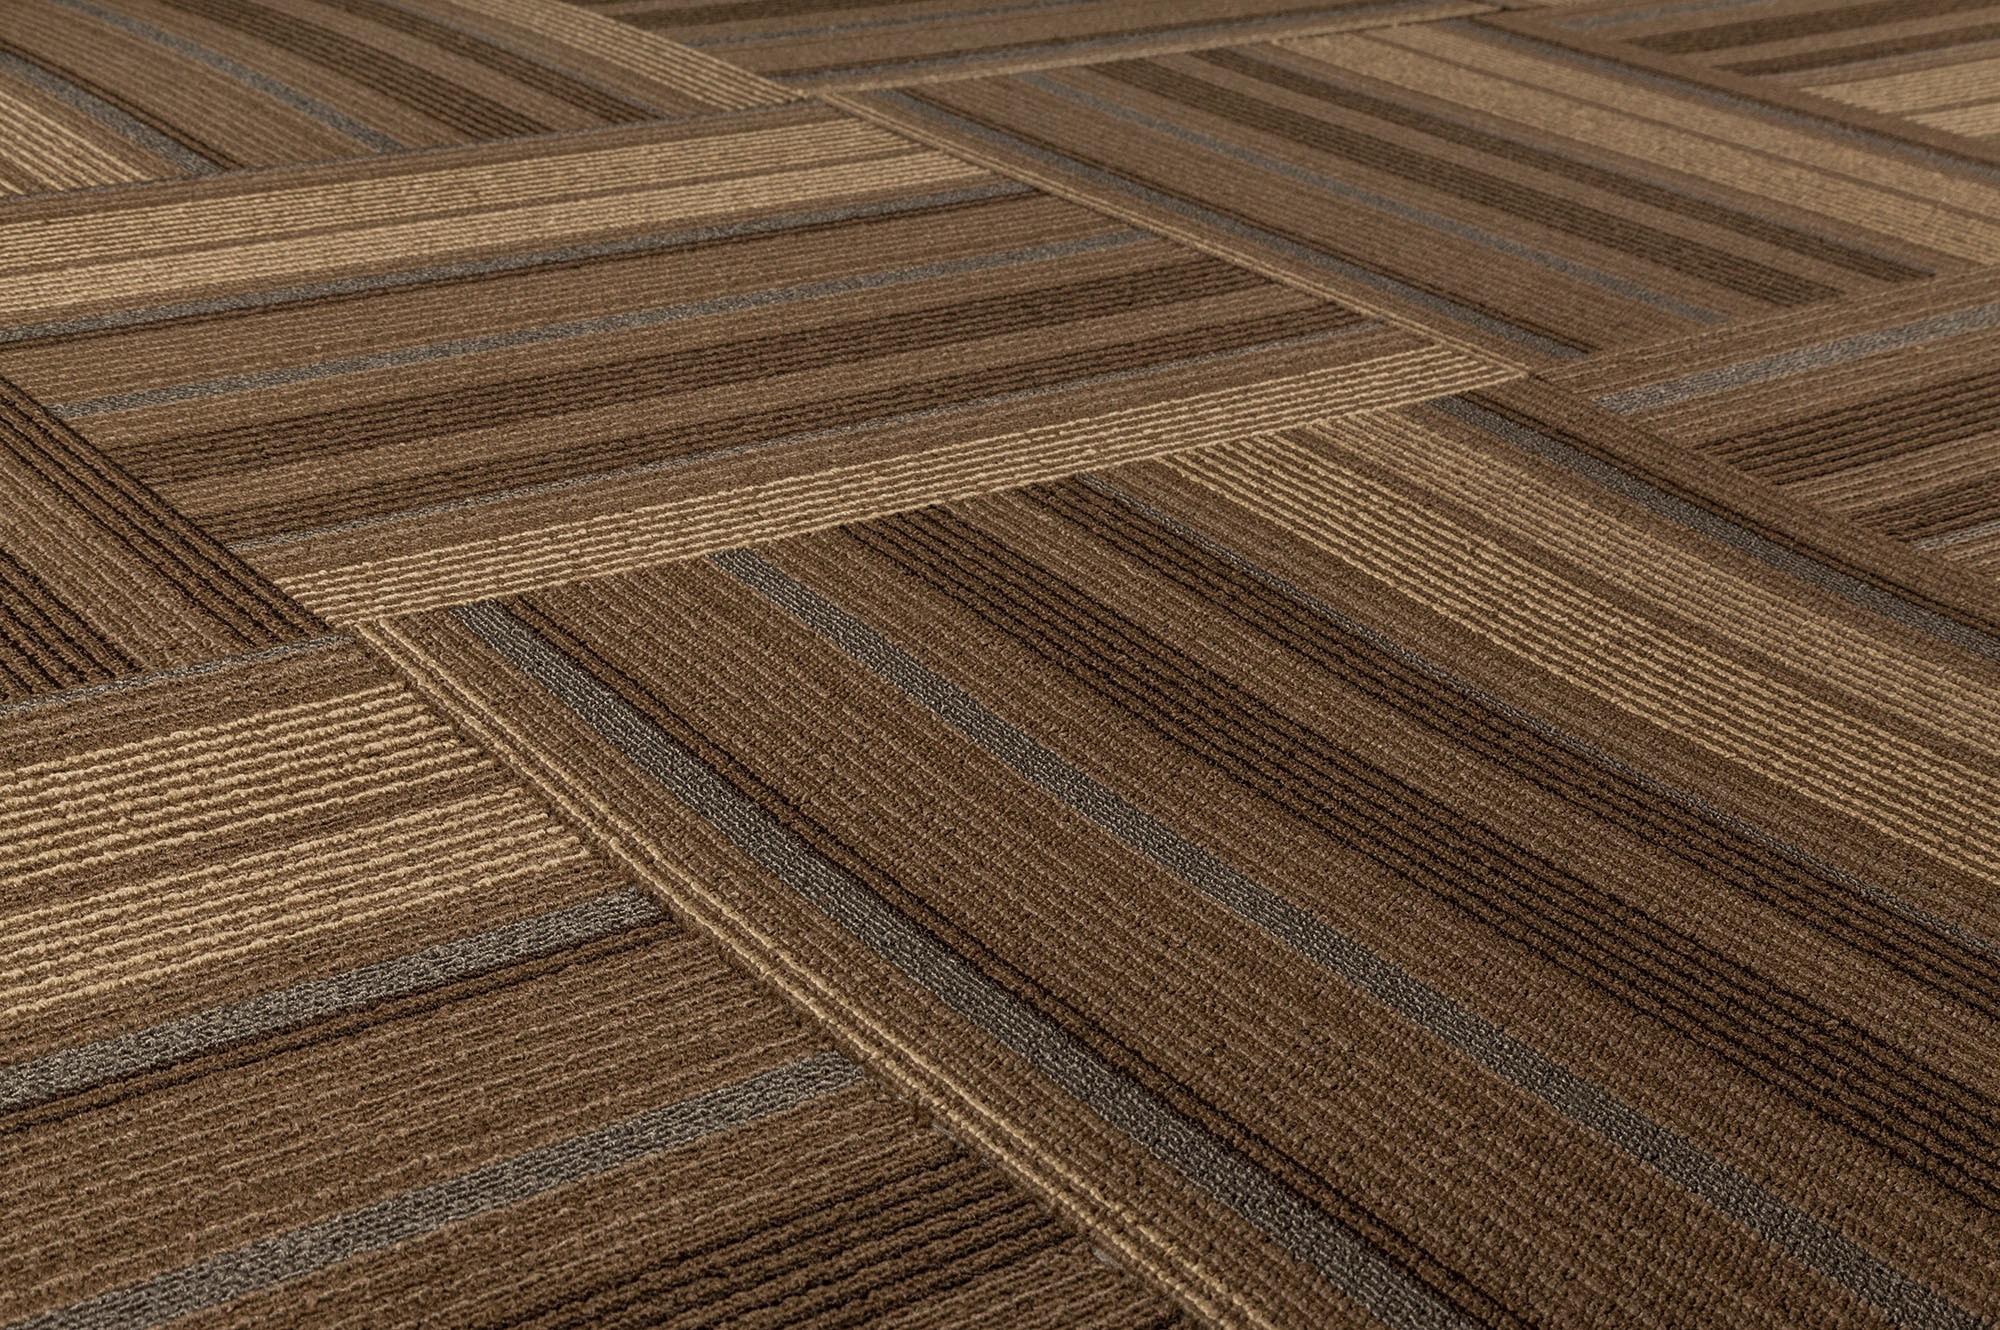 Dante carpet tile lark collection brown beige blue stripe 19 2 dante carpet tile lark collection brown beige blue stripe 19 23x19 23 baanklon Gallery